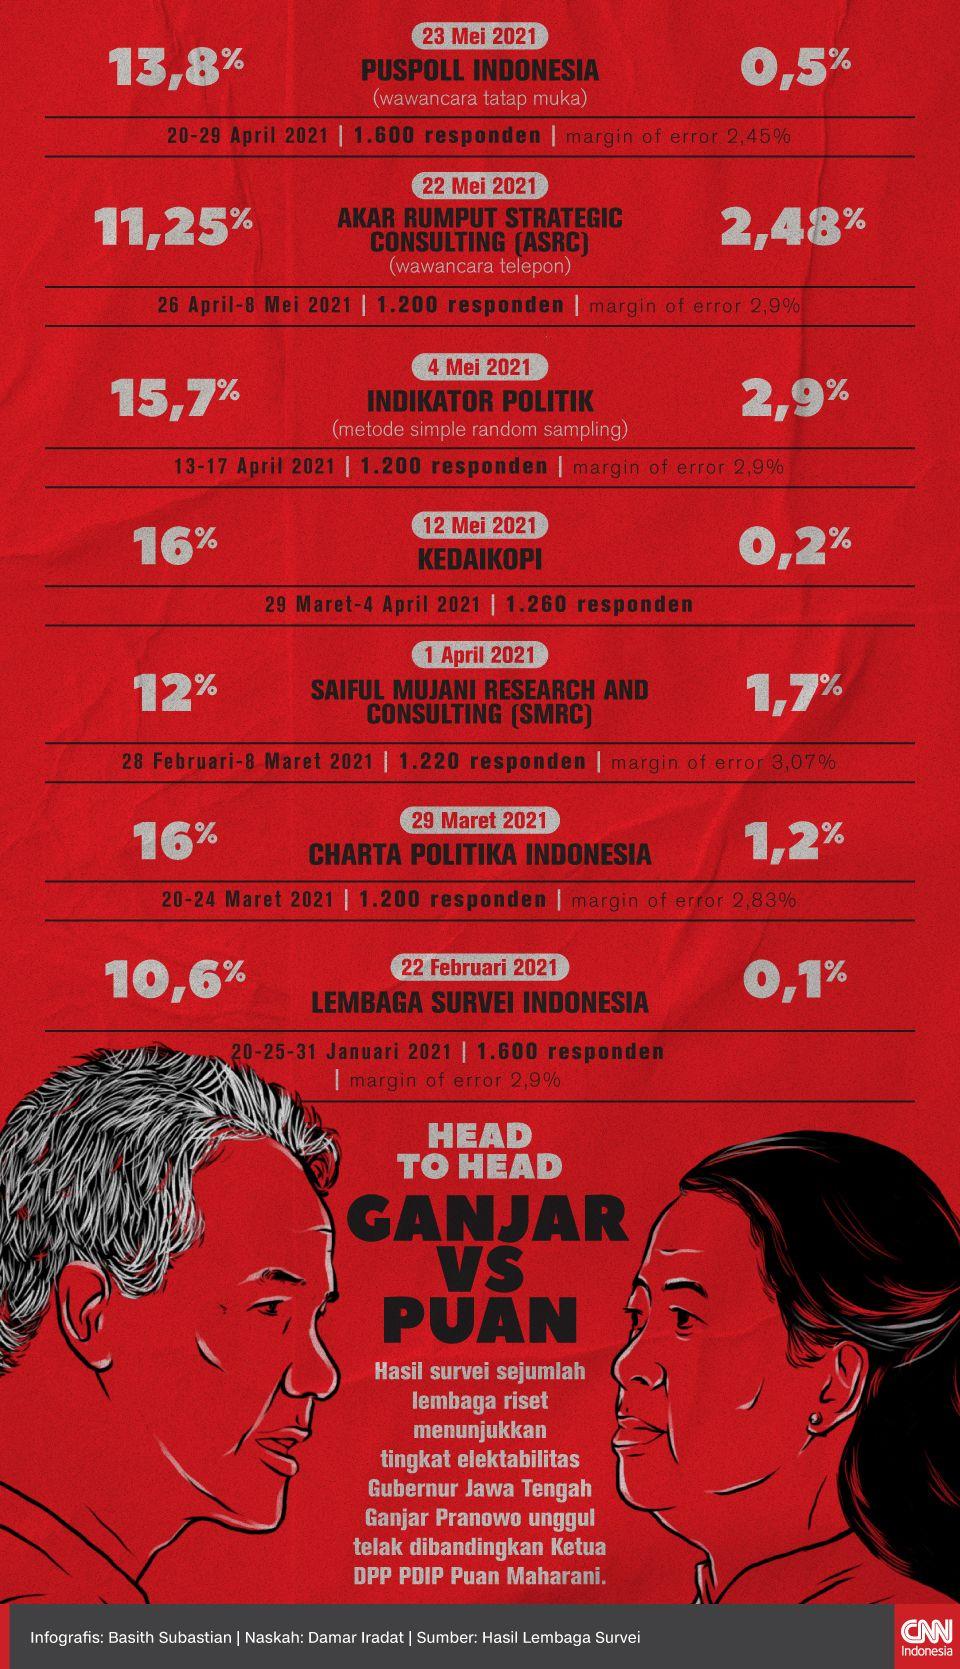 Infografis Head to Head Ganjar vs Puan